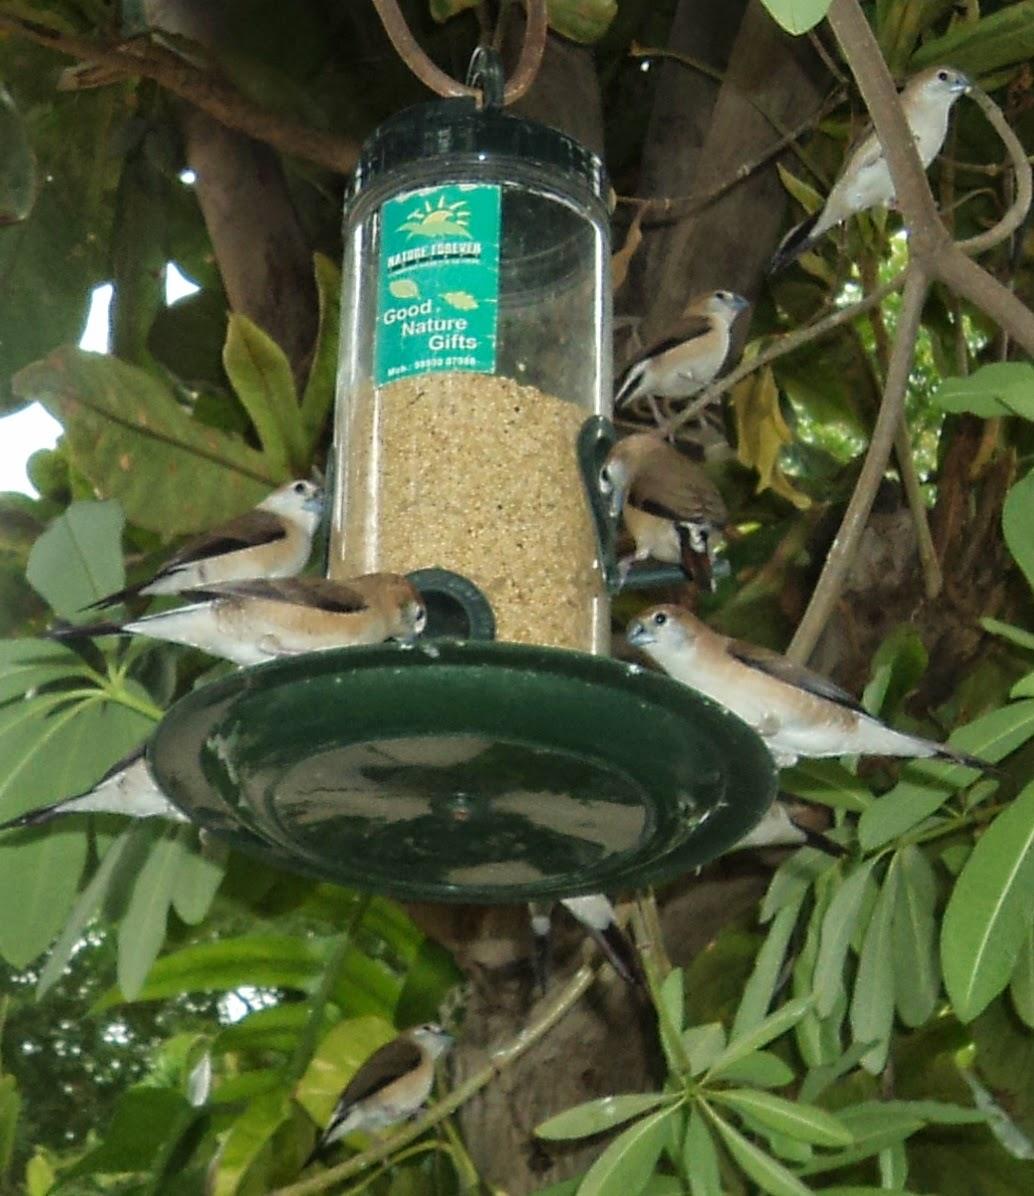 bird feeder at home backyard balcony green ahmedabad